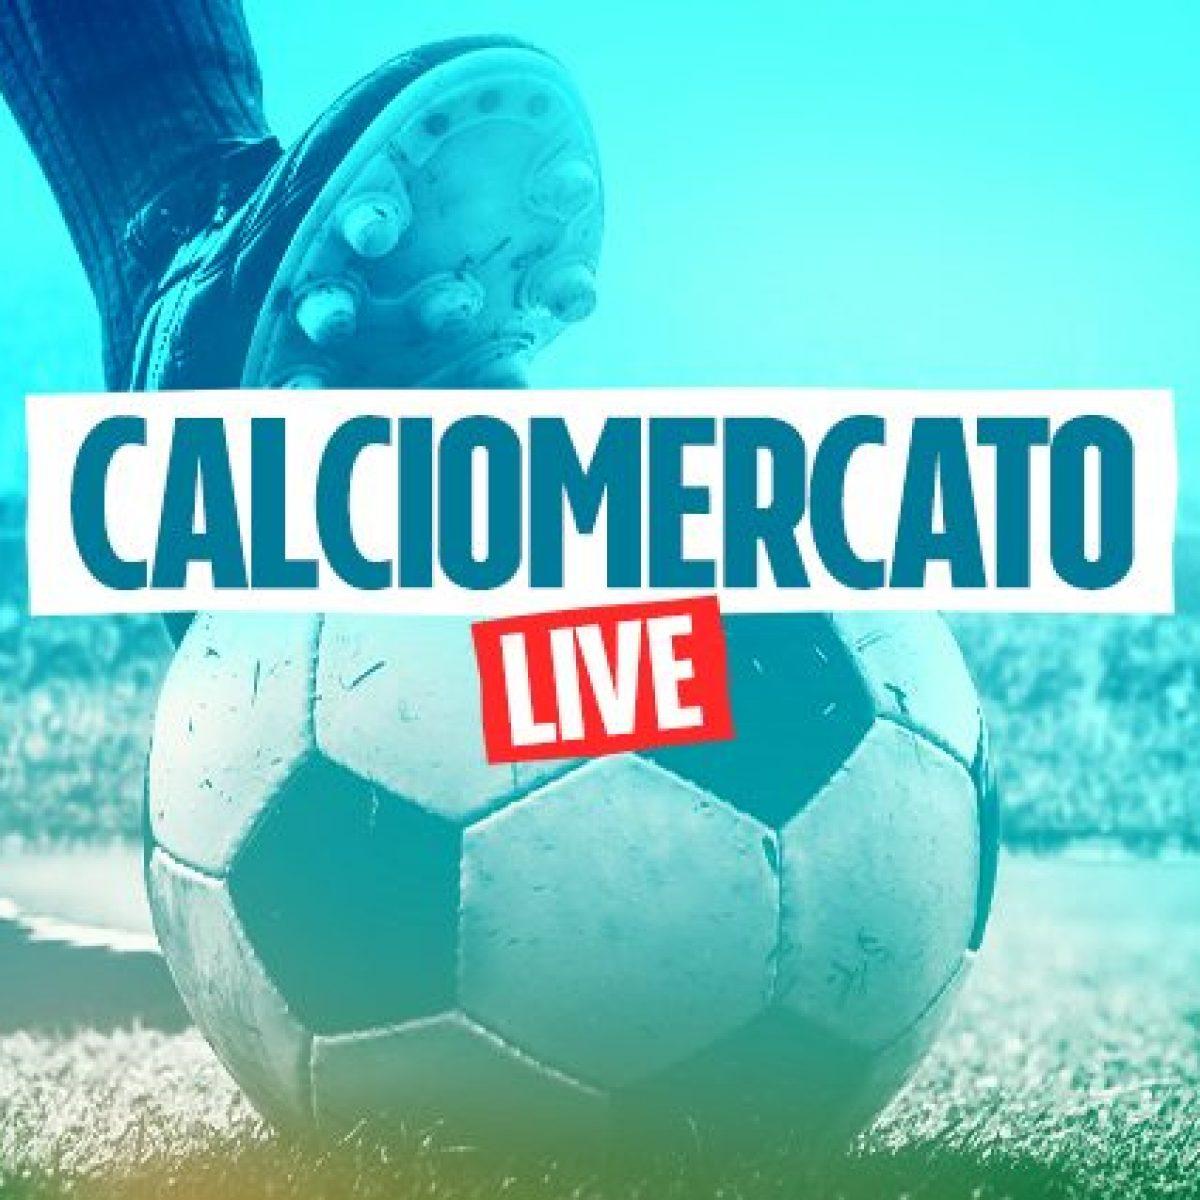 Calciomercato Ultime Notizie L Inter Prende Kolarov Juve Forte Su Suarez